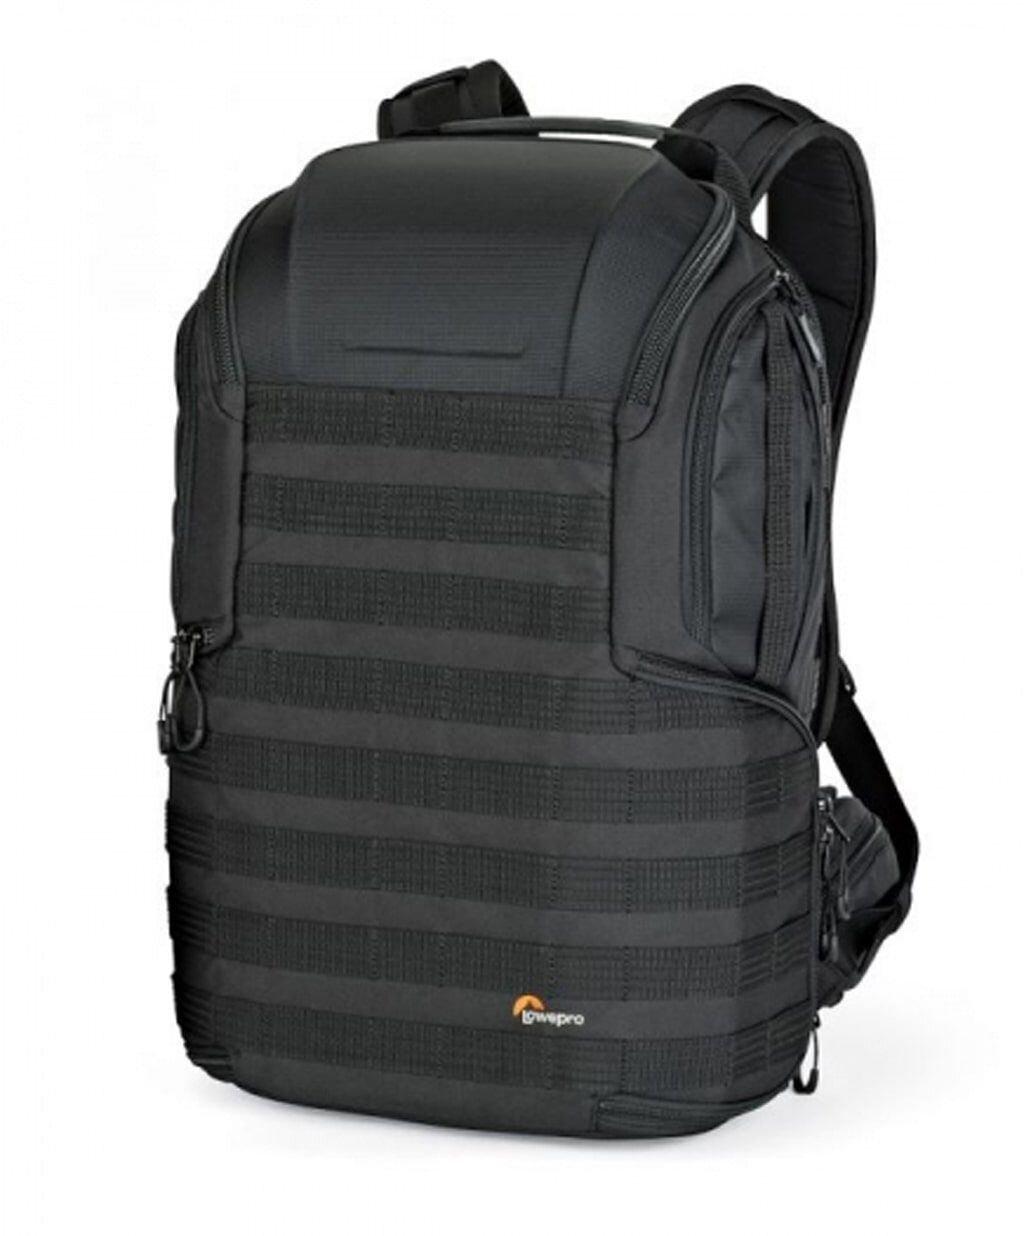 Lowepro Pro Tactic BP 450 AW II schwarz